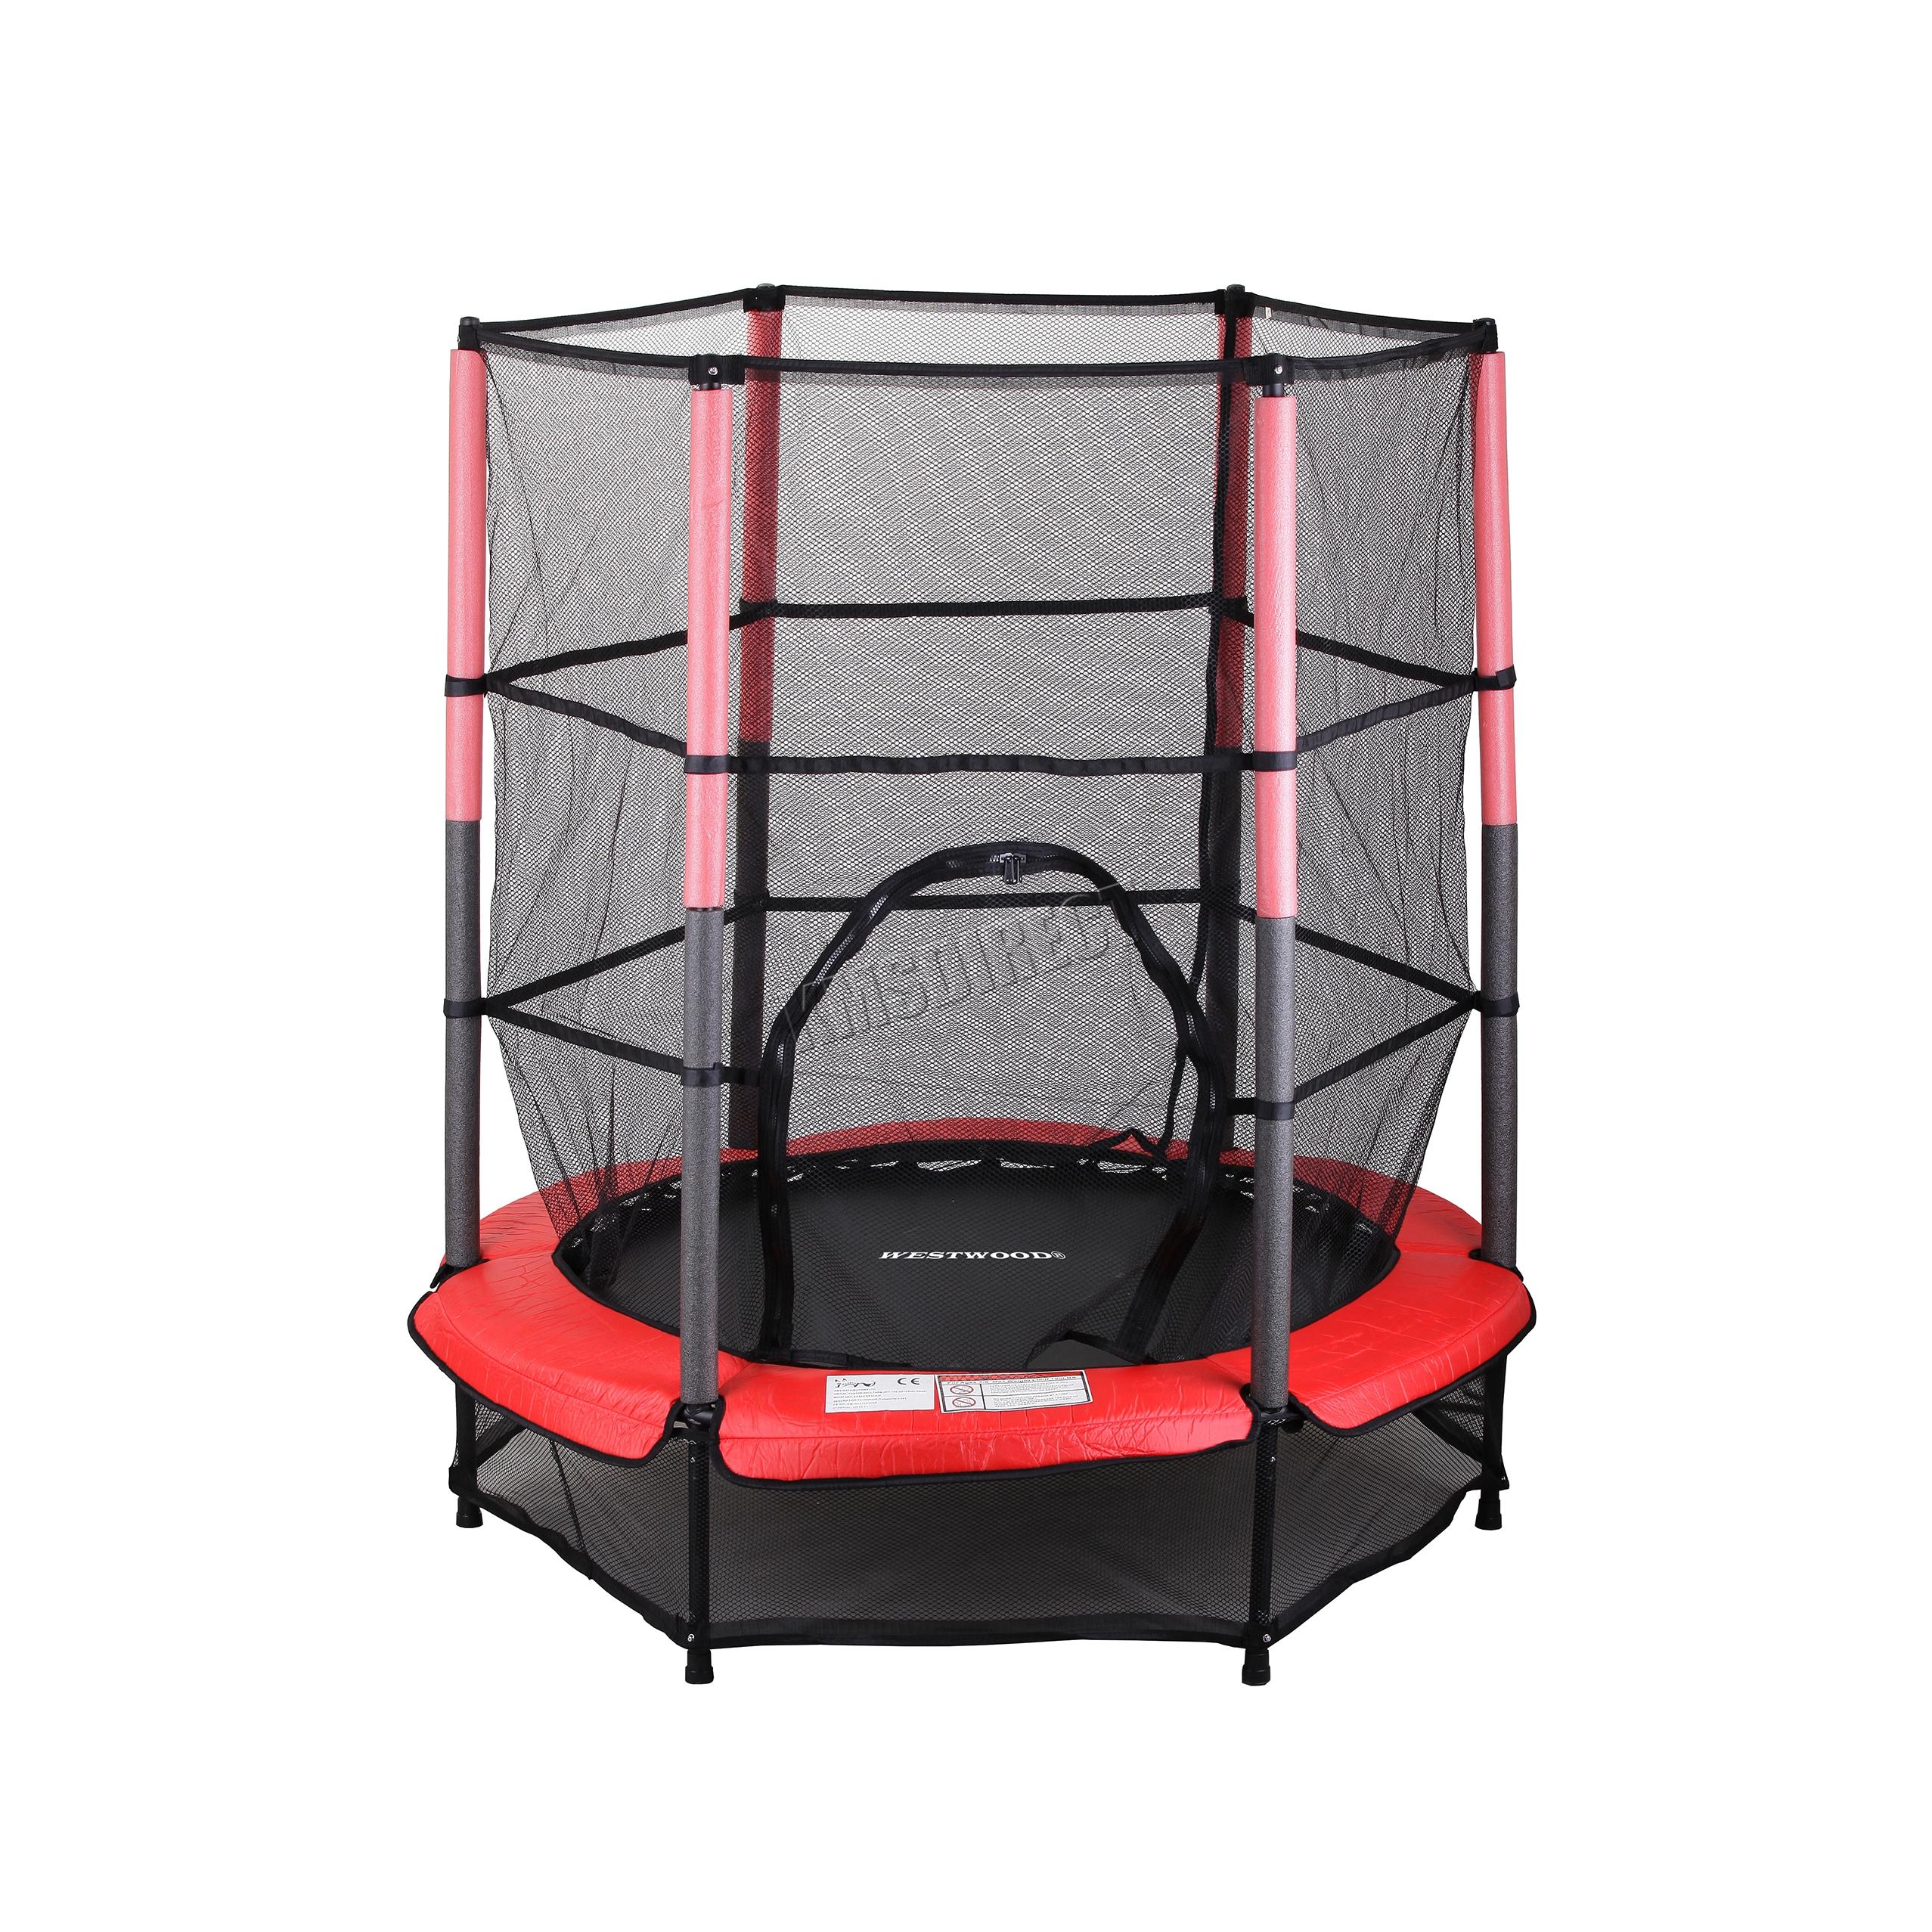 Westwood Children S Mini Trampoline With Safety Net 4